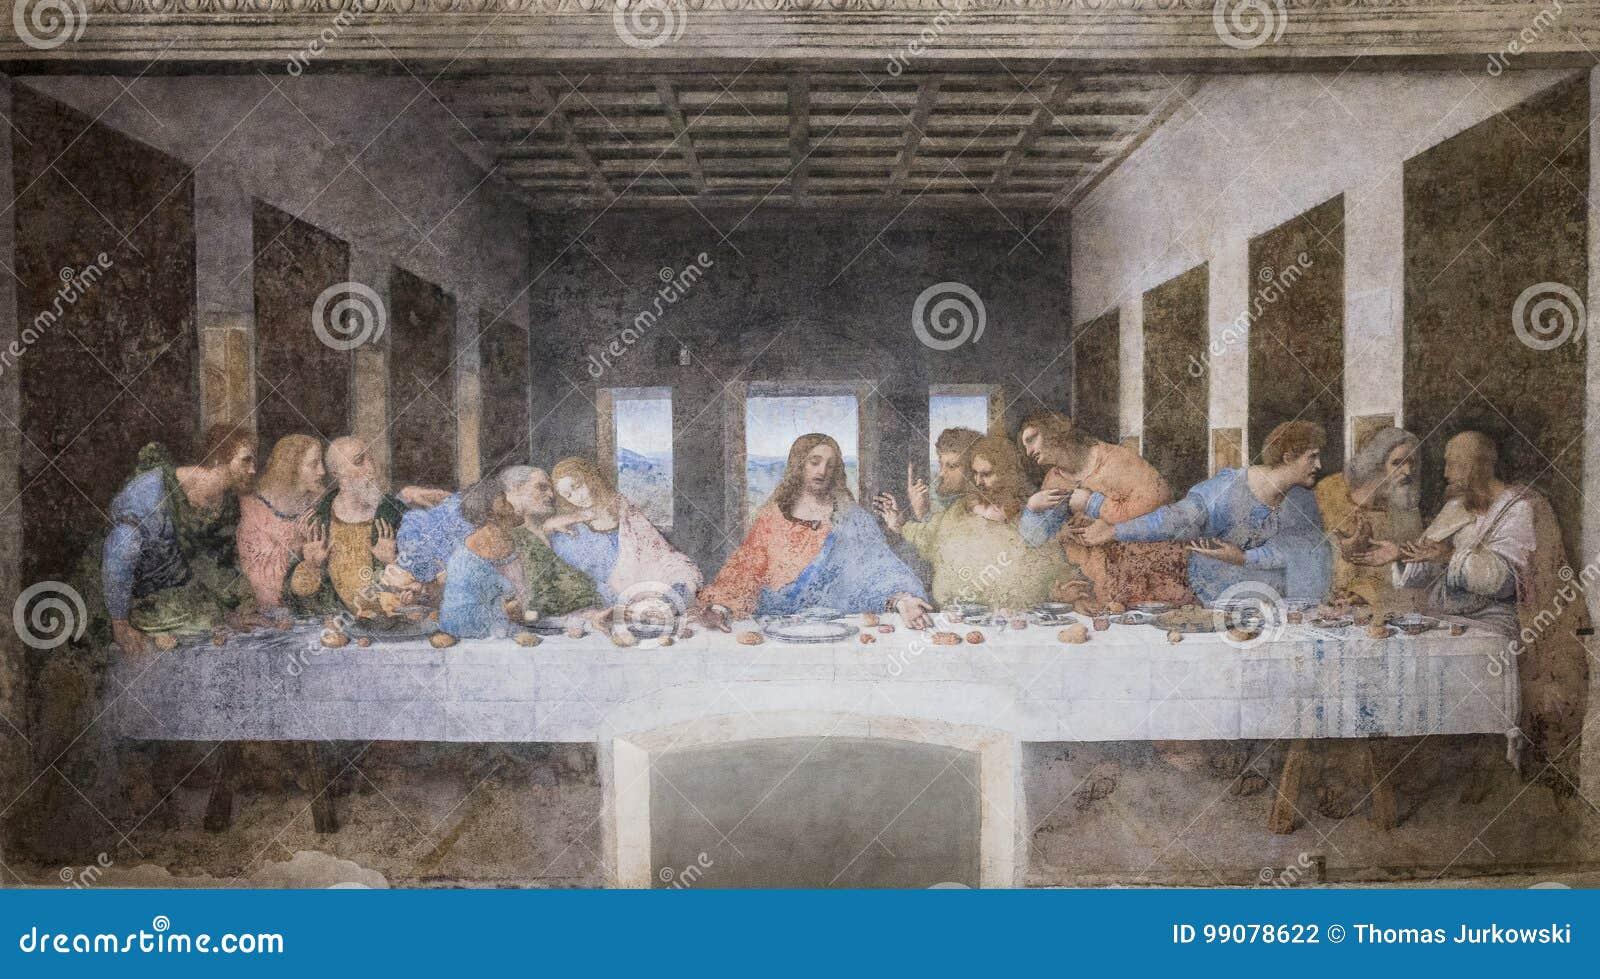 Peinture de dernier dîner